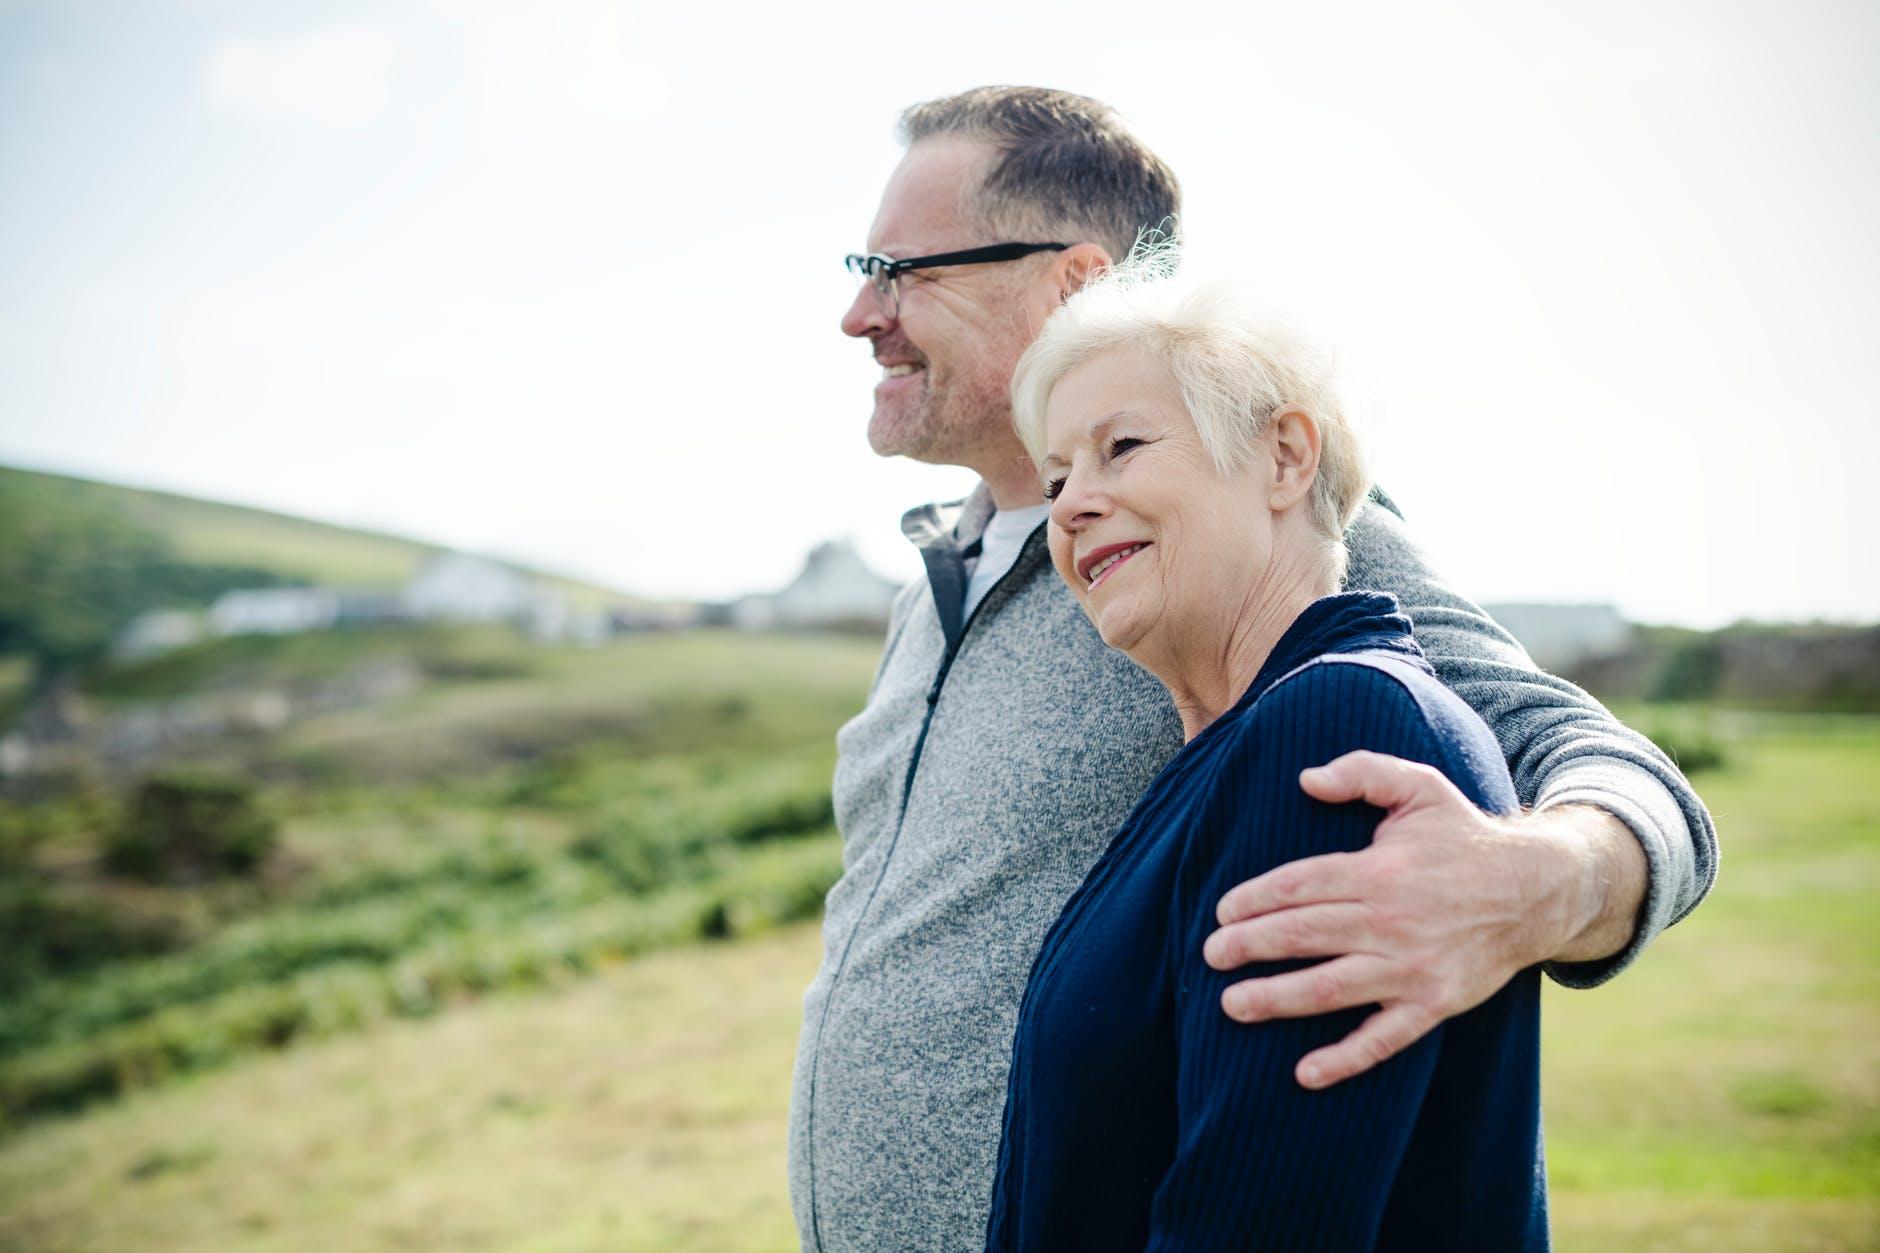 Le RIVASTIGMINE BIOGARAN 9,5 mg/24 h, pour éviter l'Alzheimer